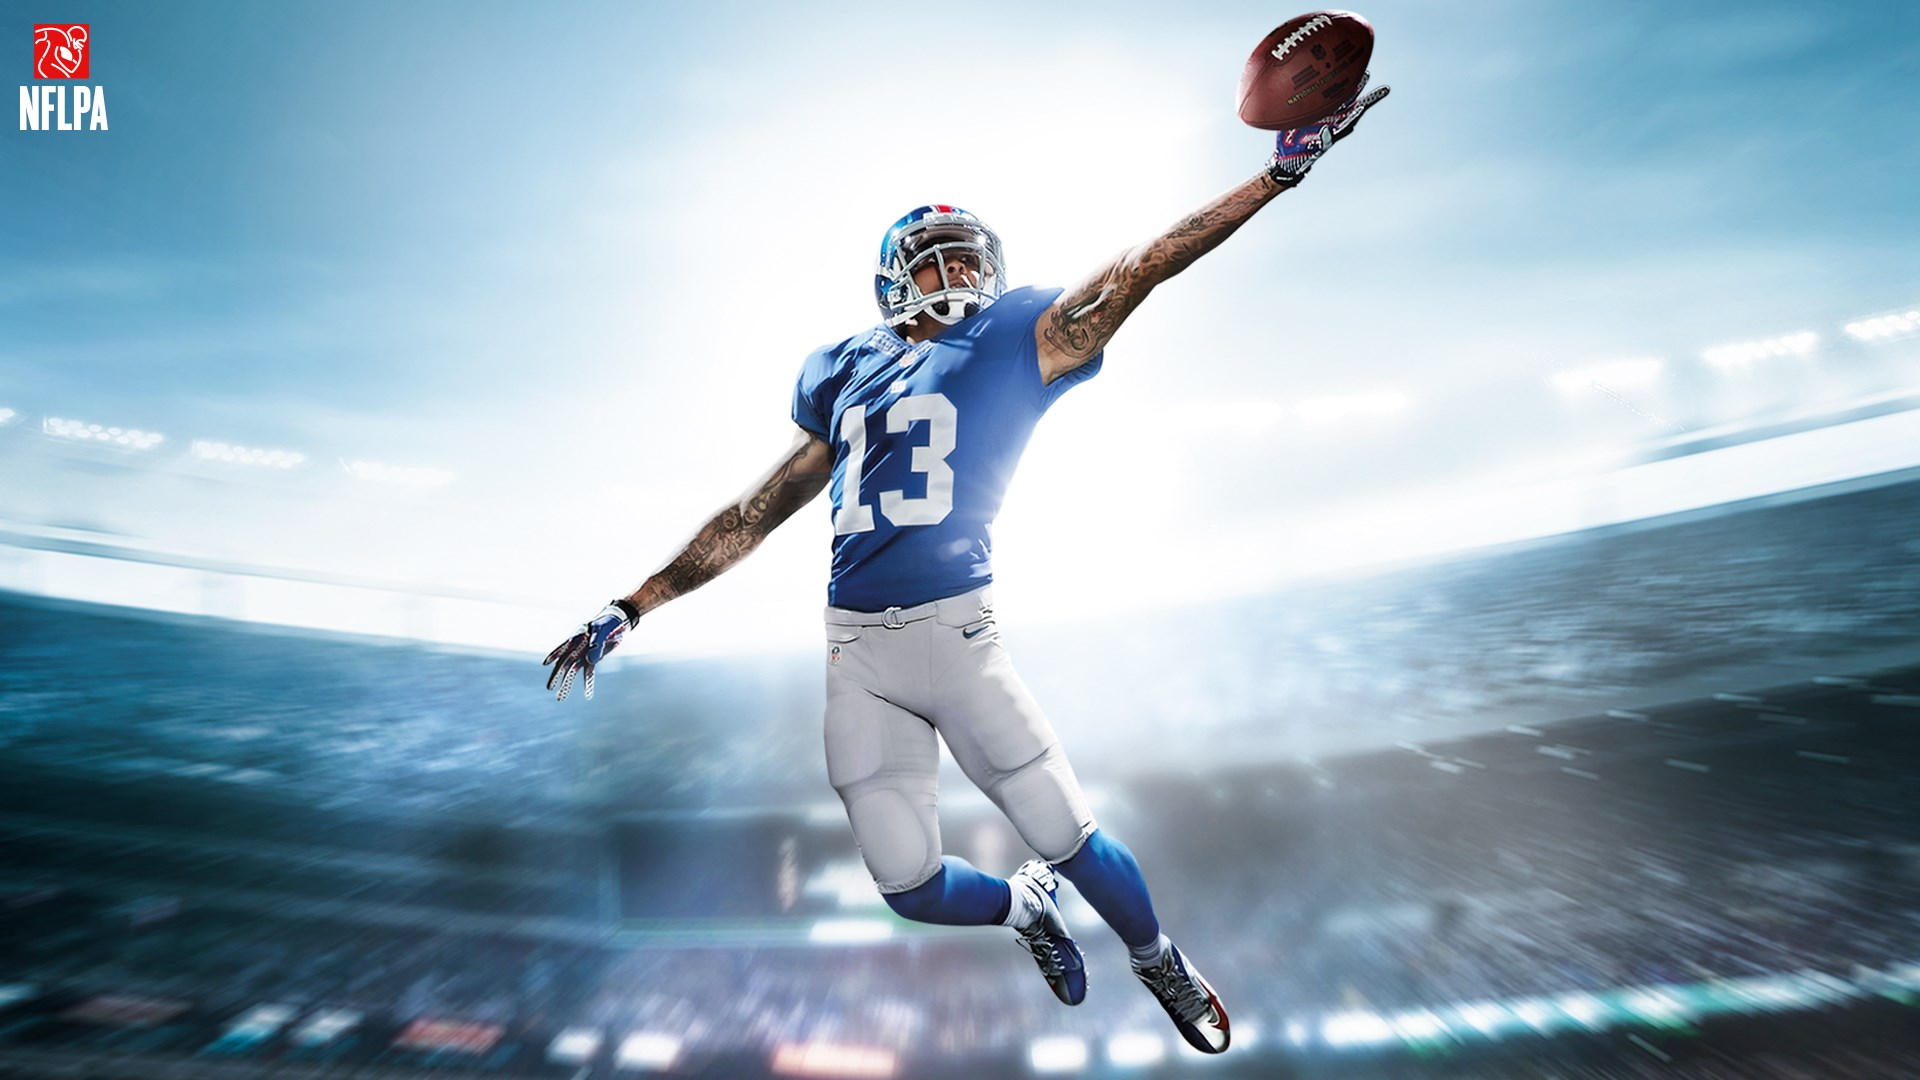 Madden NFL 16 Player Likeness Update